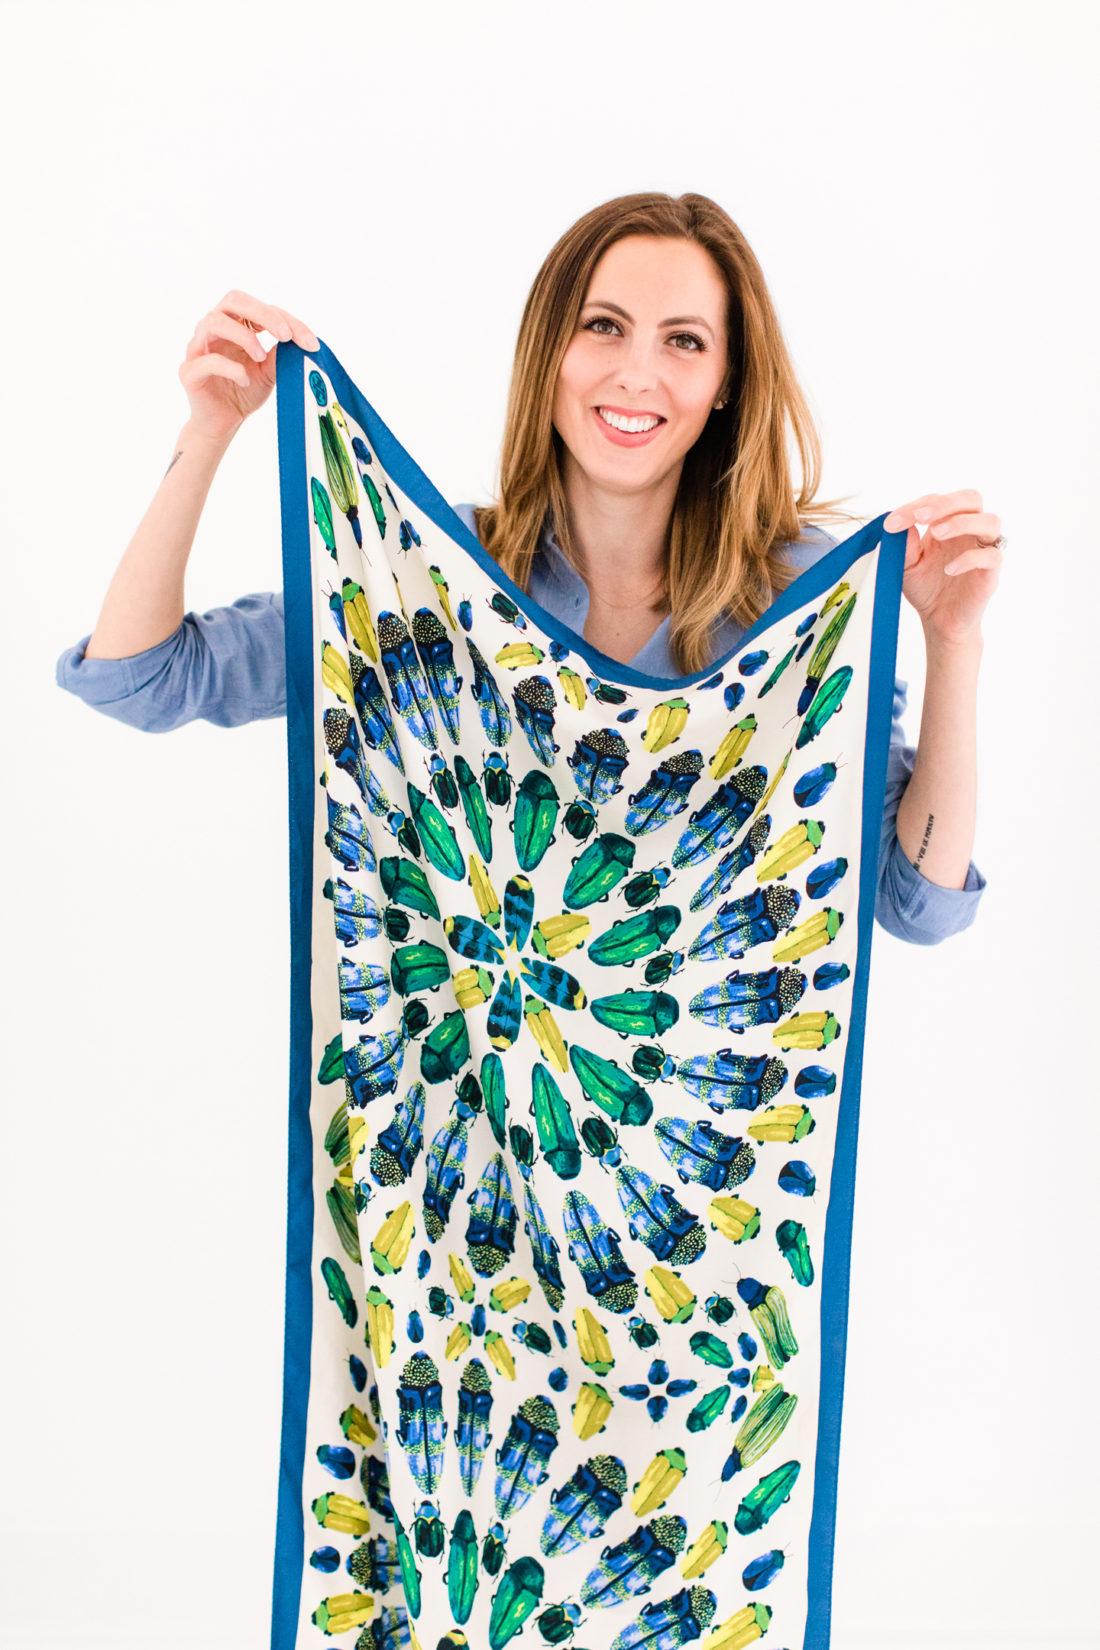 Eva Amurri Martino holds up a printed silk tory burch scarf